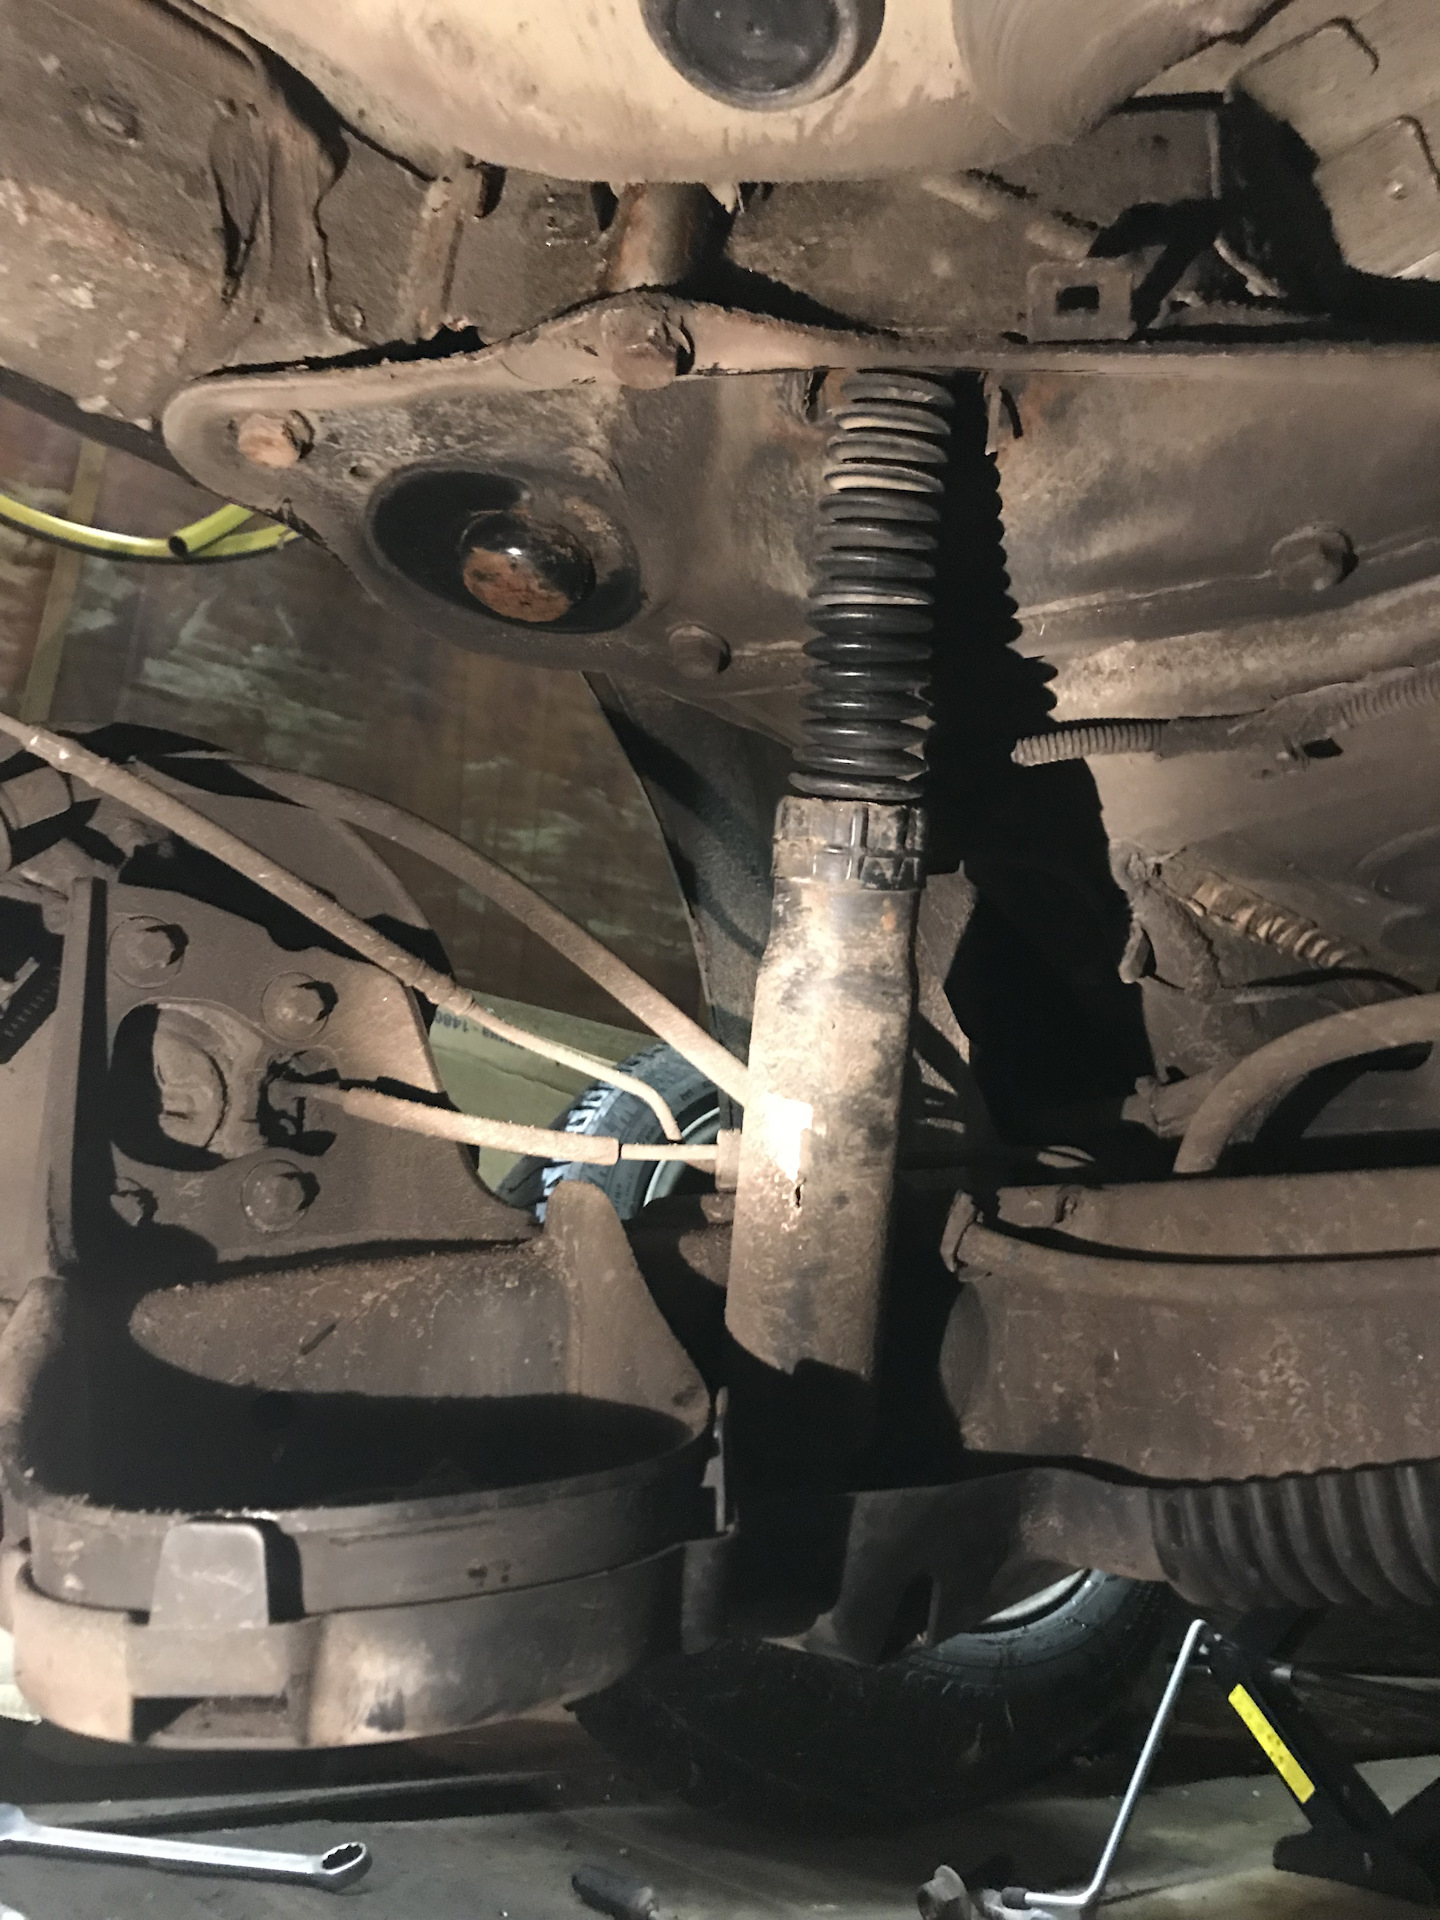 Замена переднего кронштейна ситроен дс 5 Замена троса газа митсубиси аутлендер xl